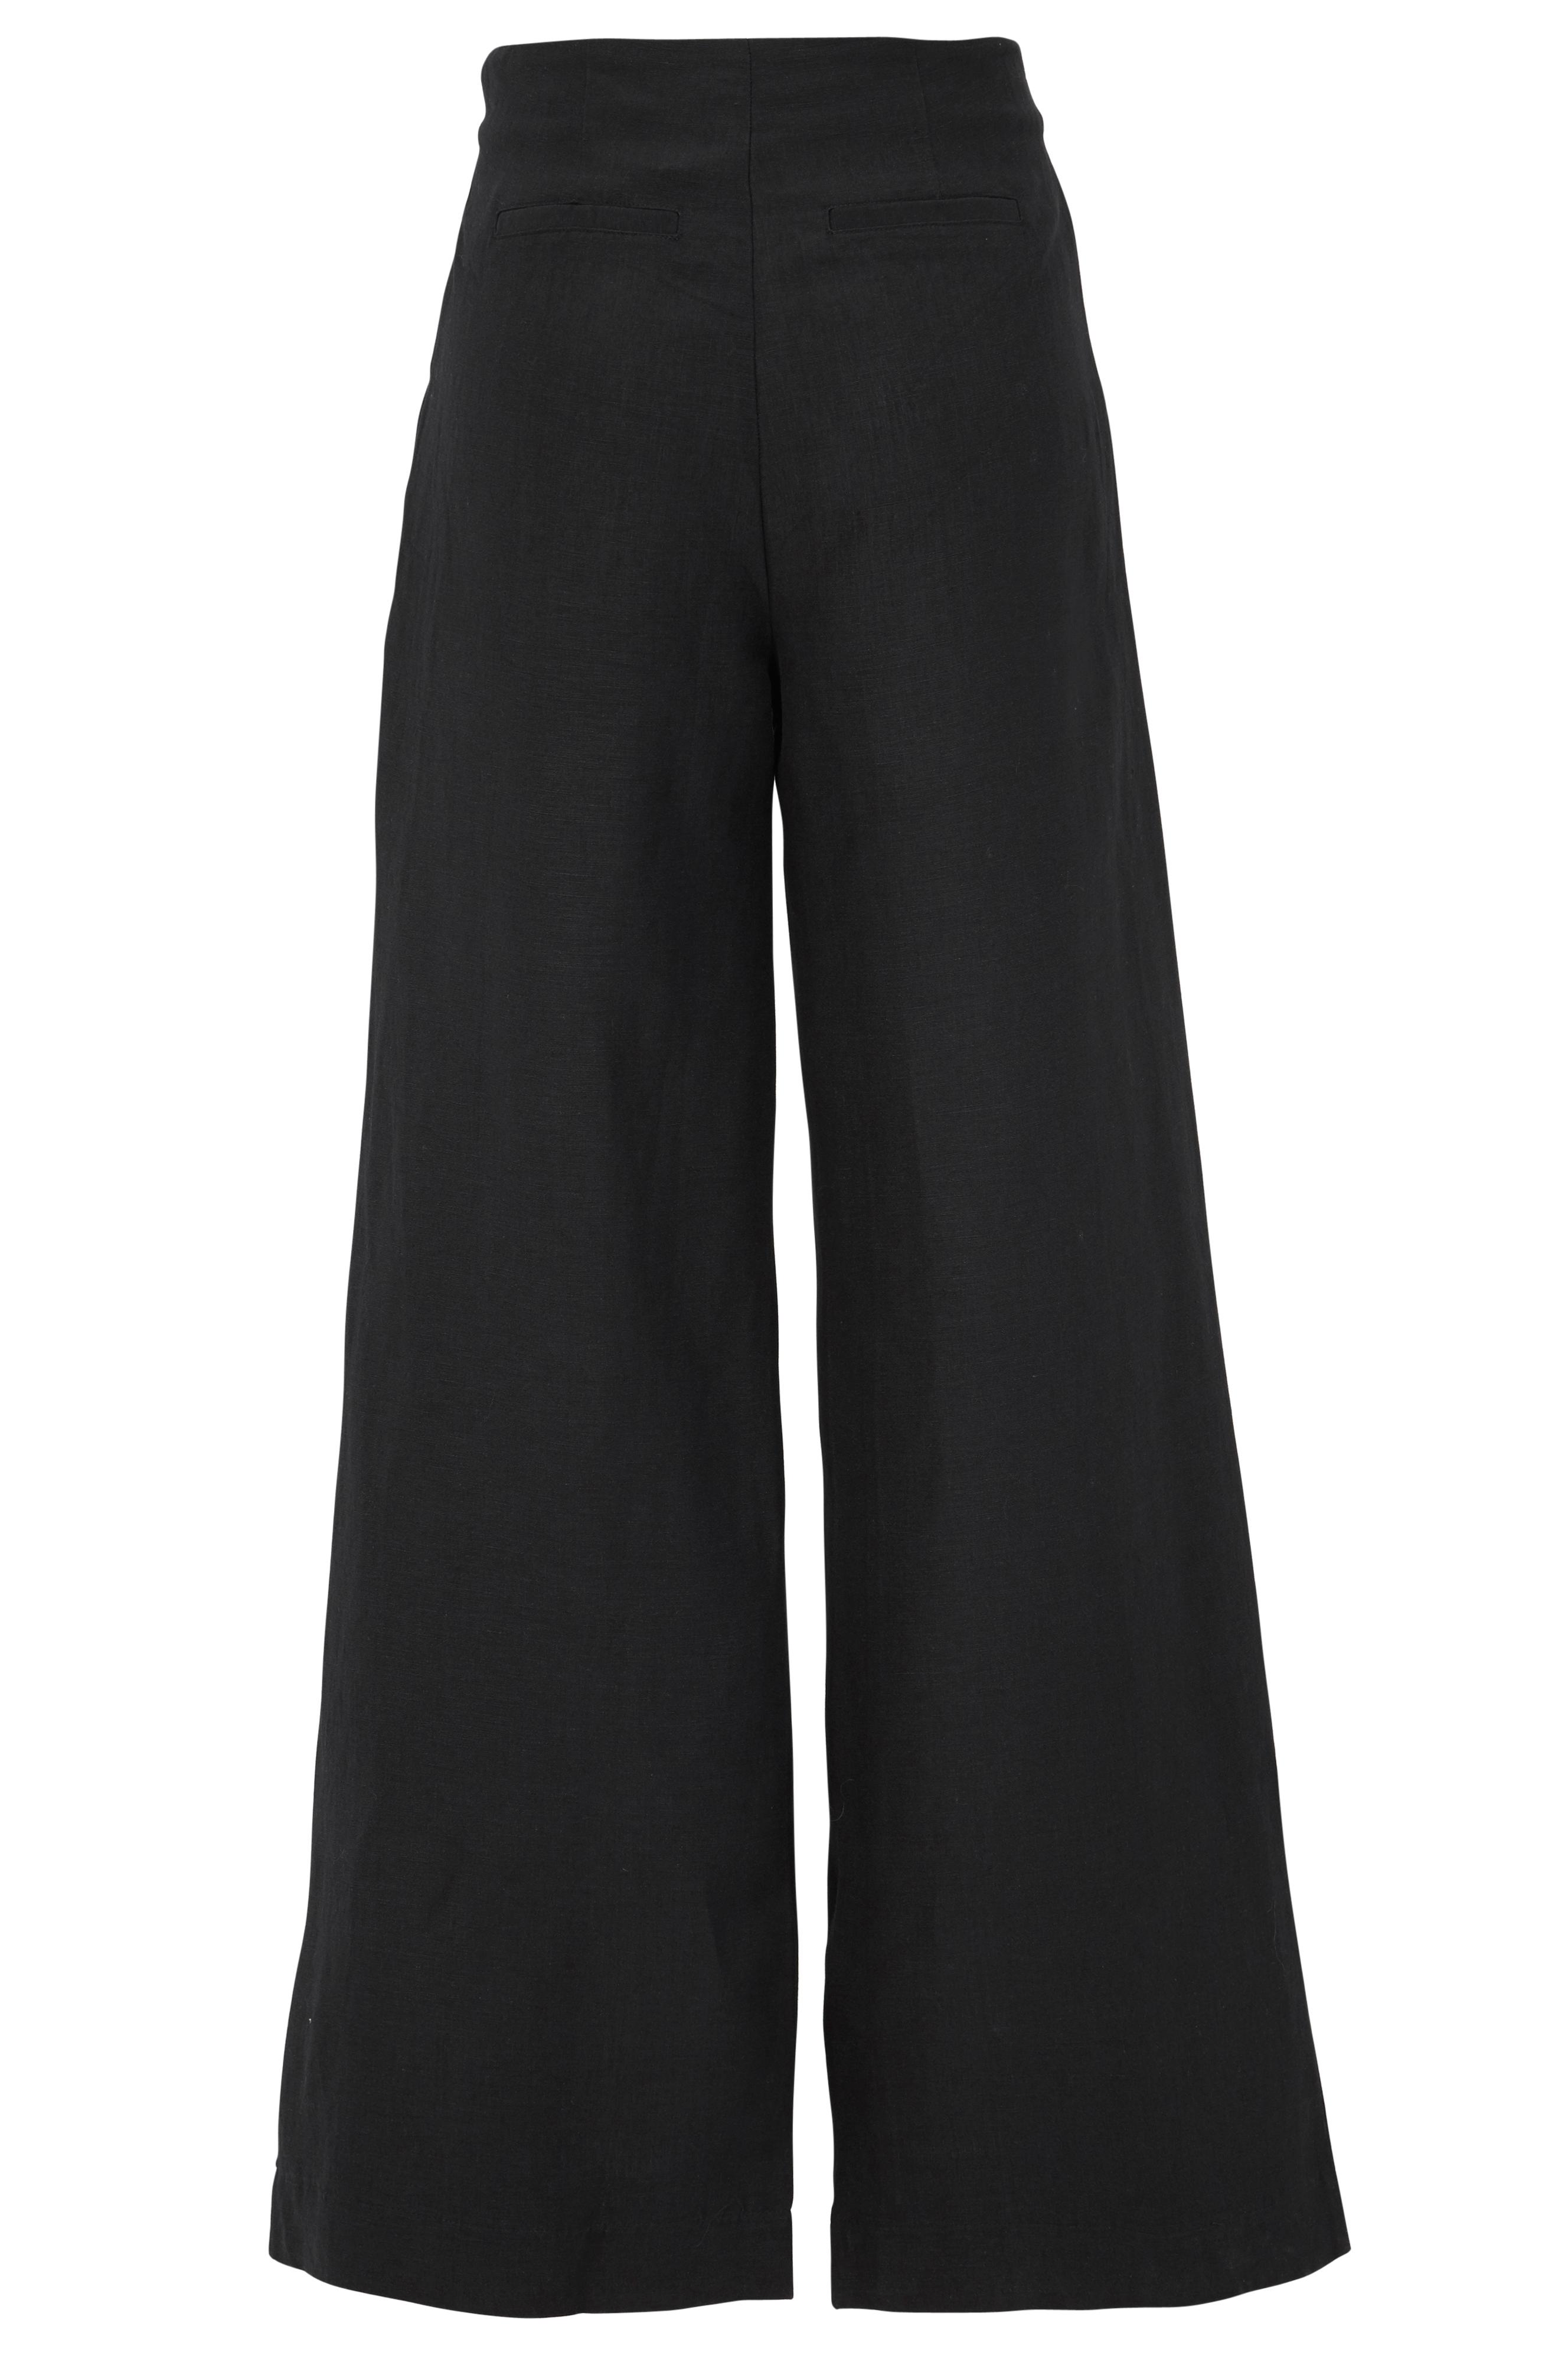 Ellos Collection Freja-pellavahousut - Musta - Naiset - Ellos.fi c8839d56b5